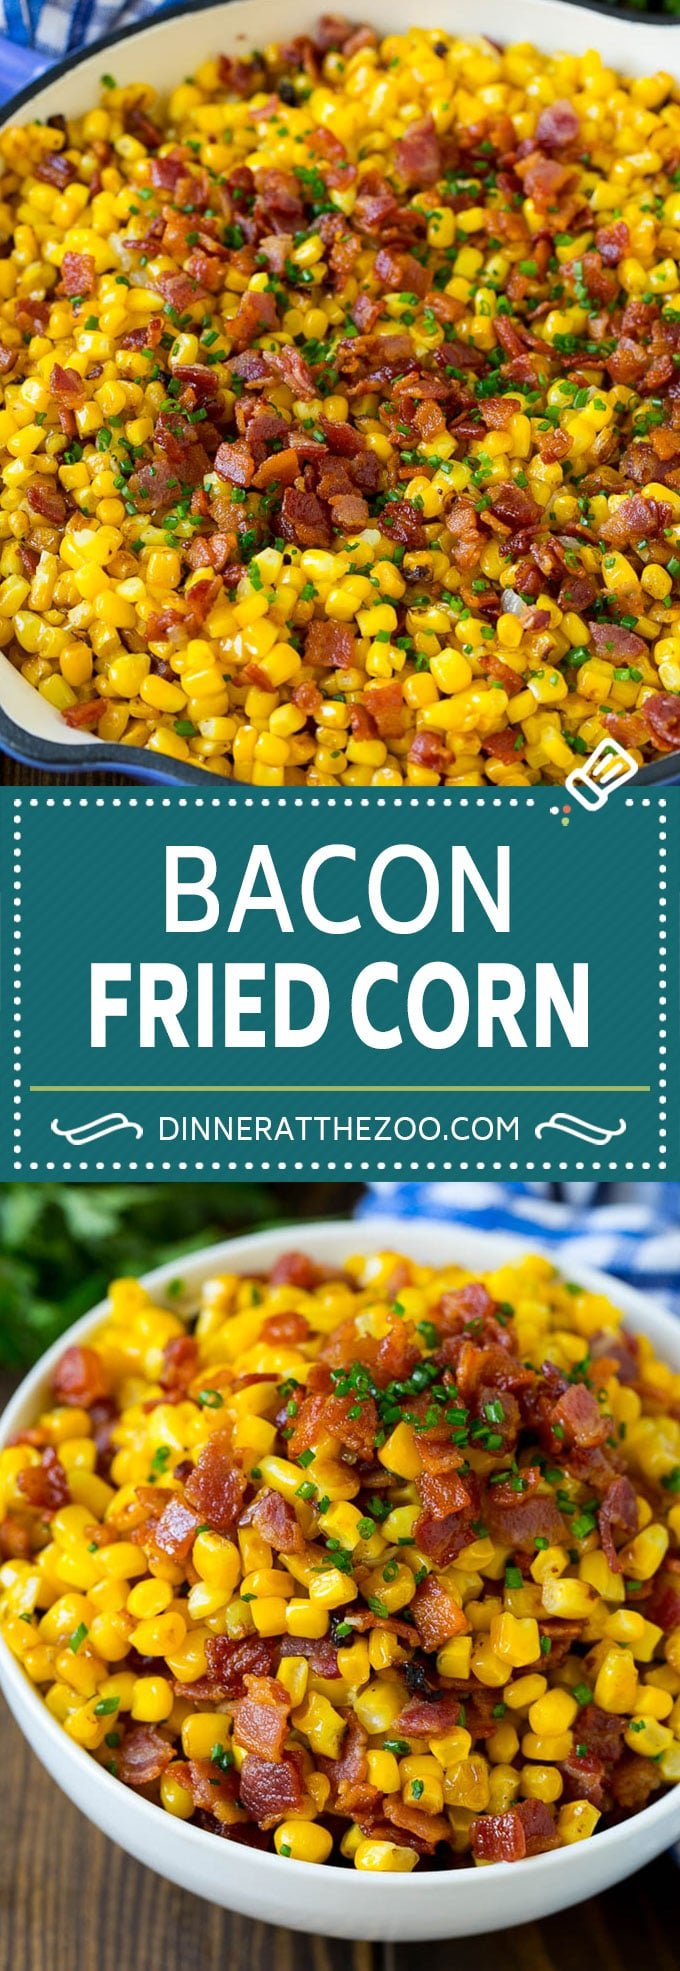 Bacon Fried Corn Recipe | Sauteed Corn | Corn Side Dish #corn #bacon #sidedish #glutenfree #dinner #dinneratthezoo